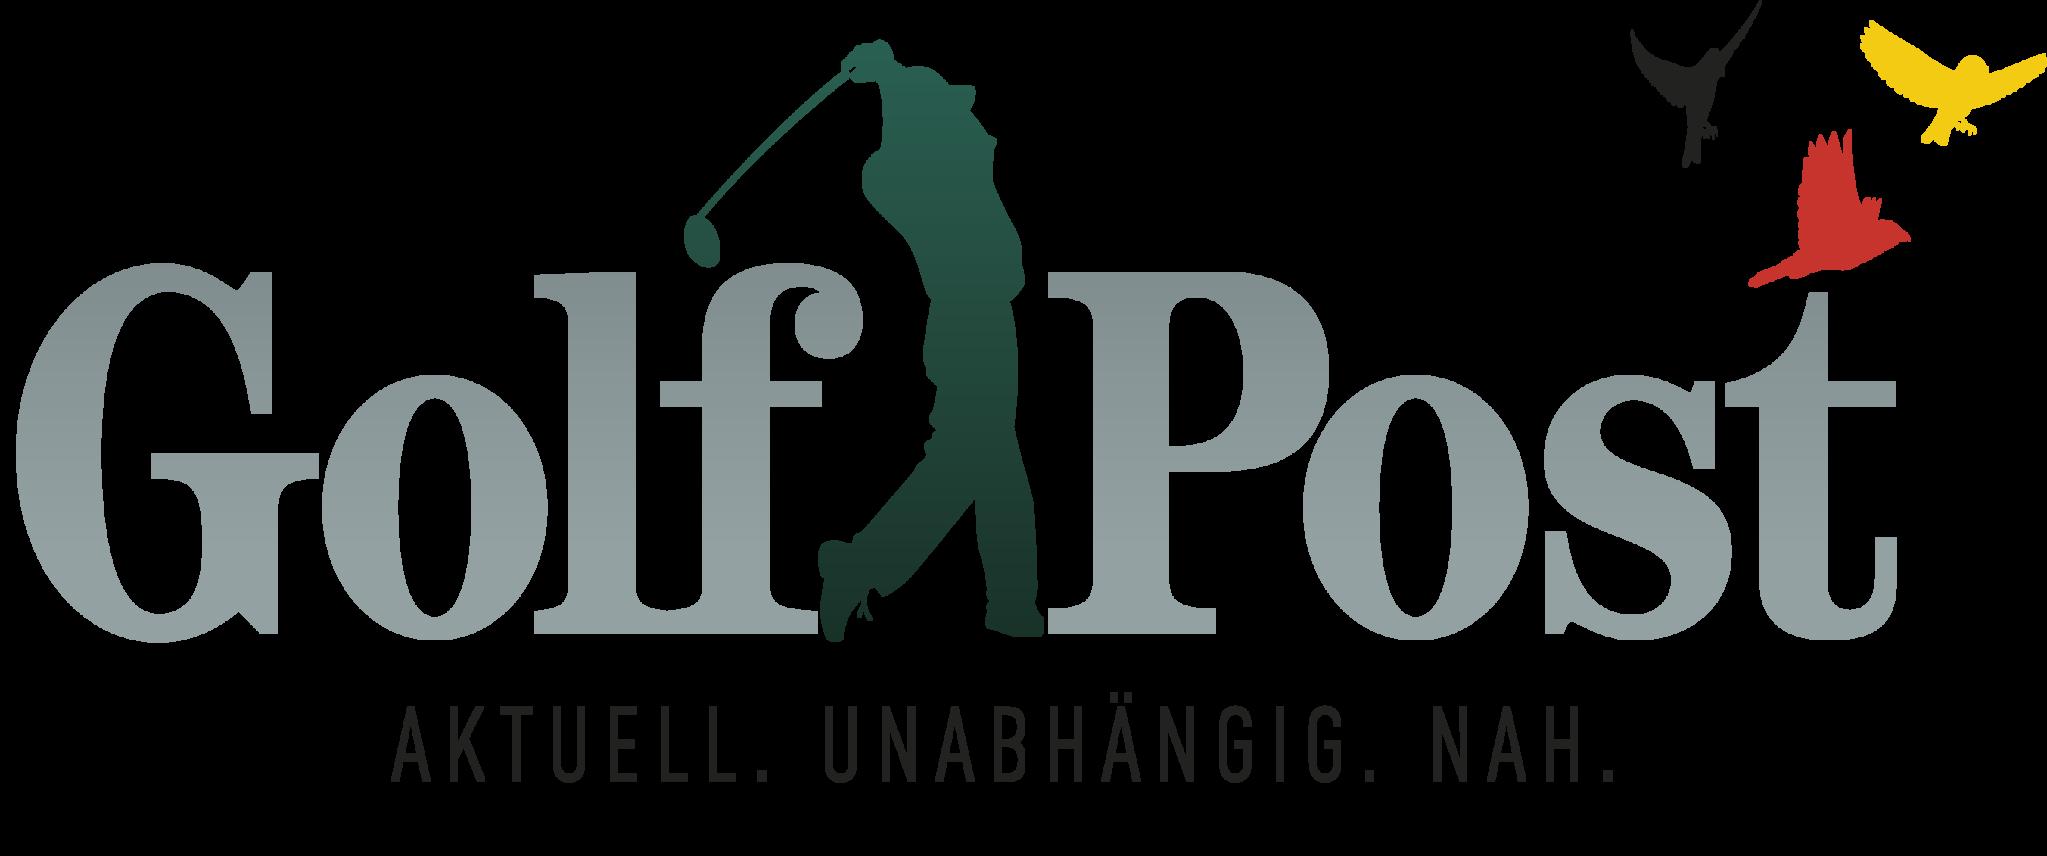 Golfpost